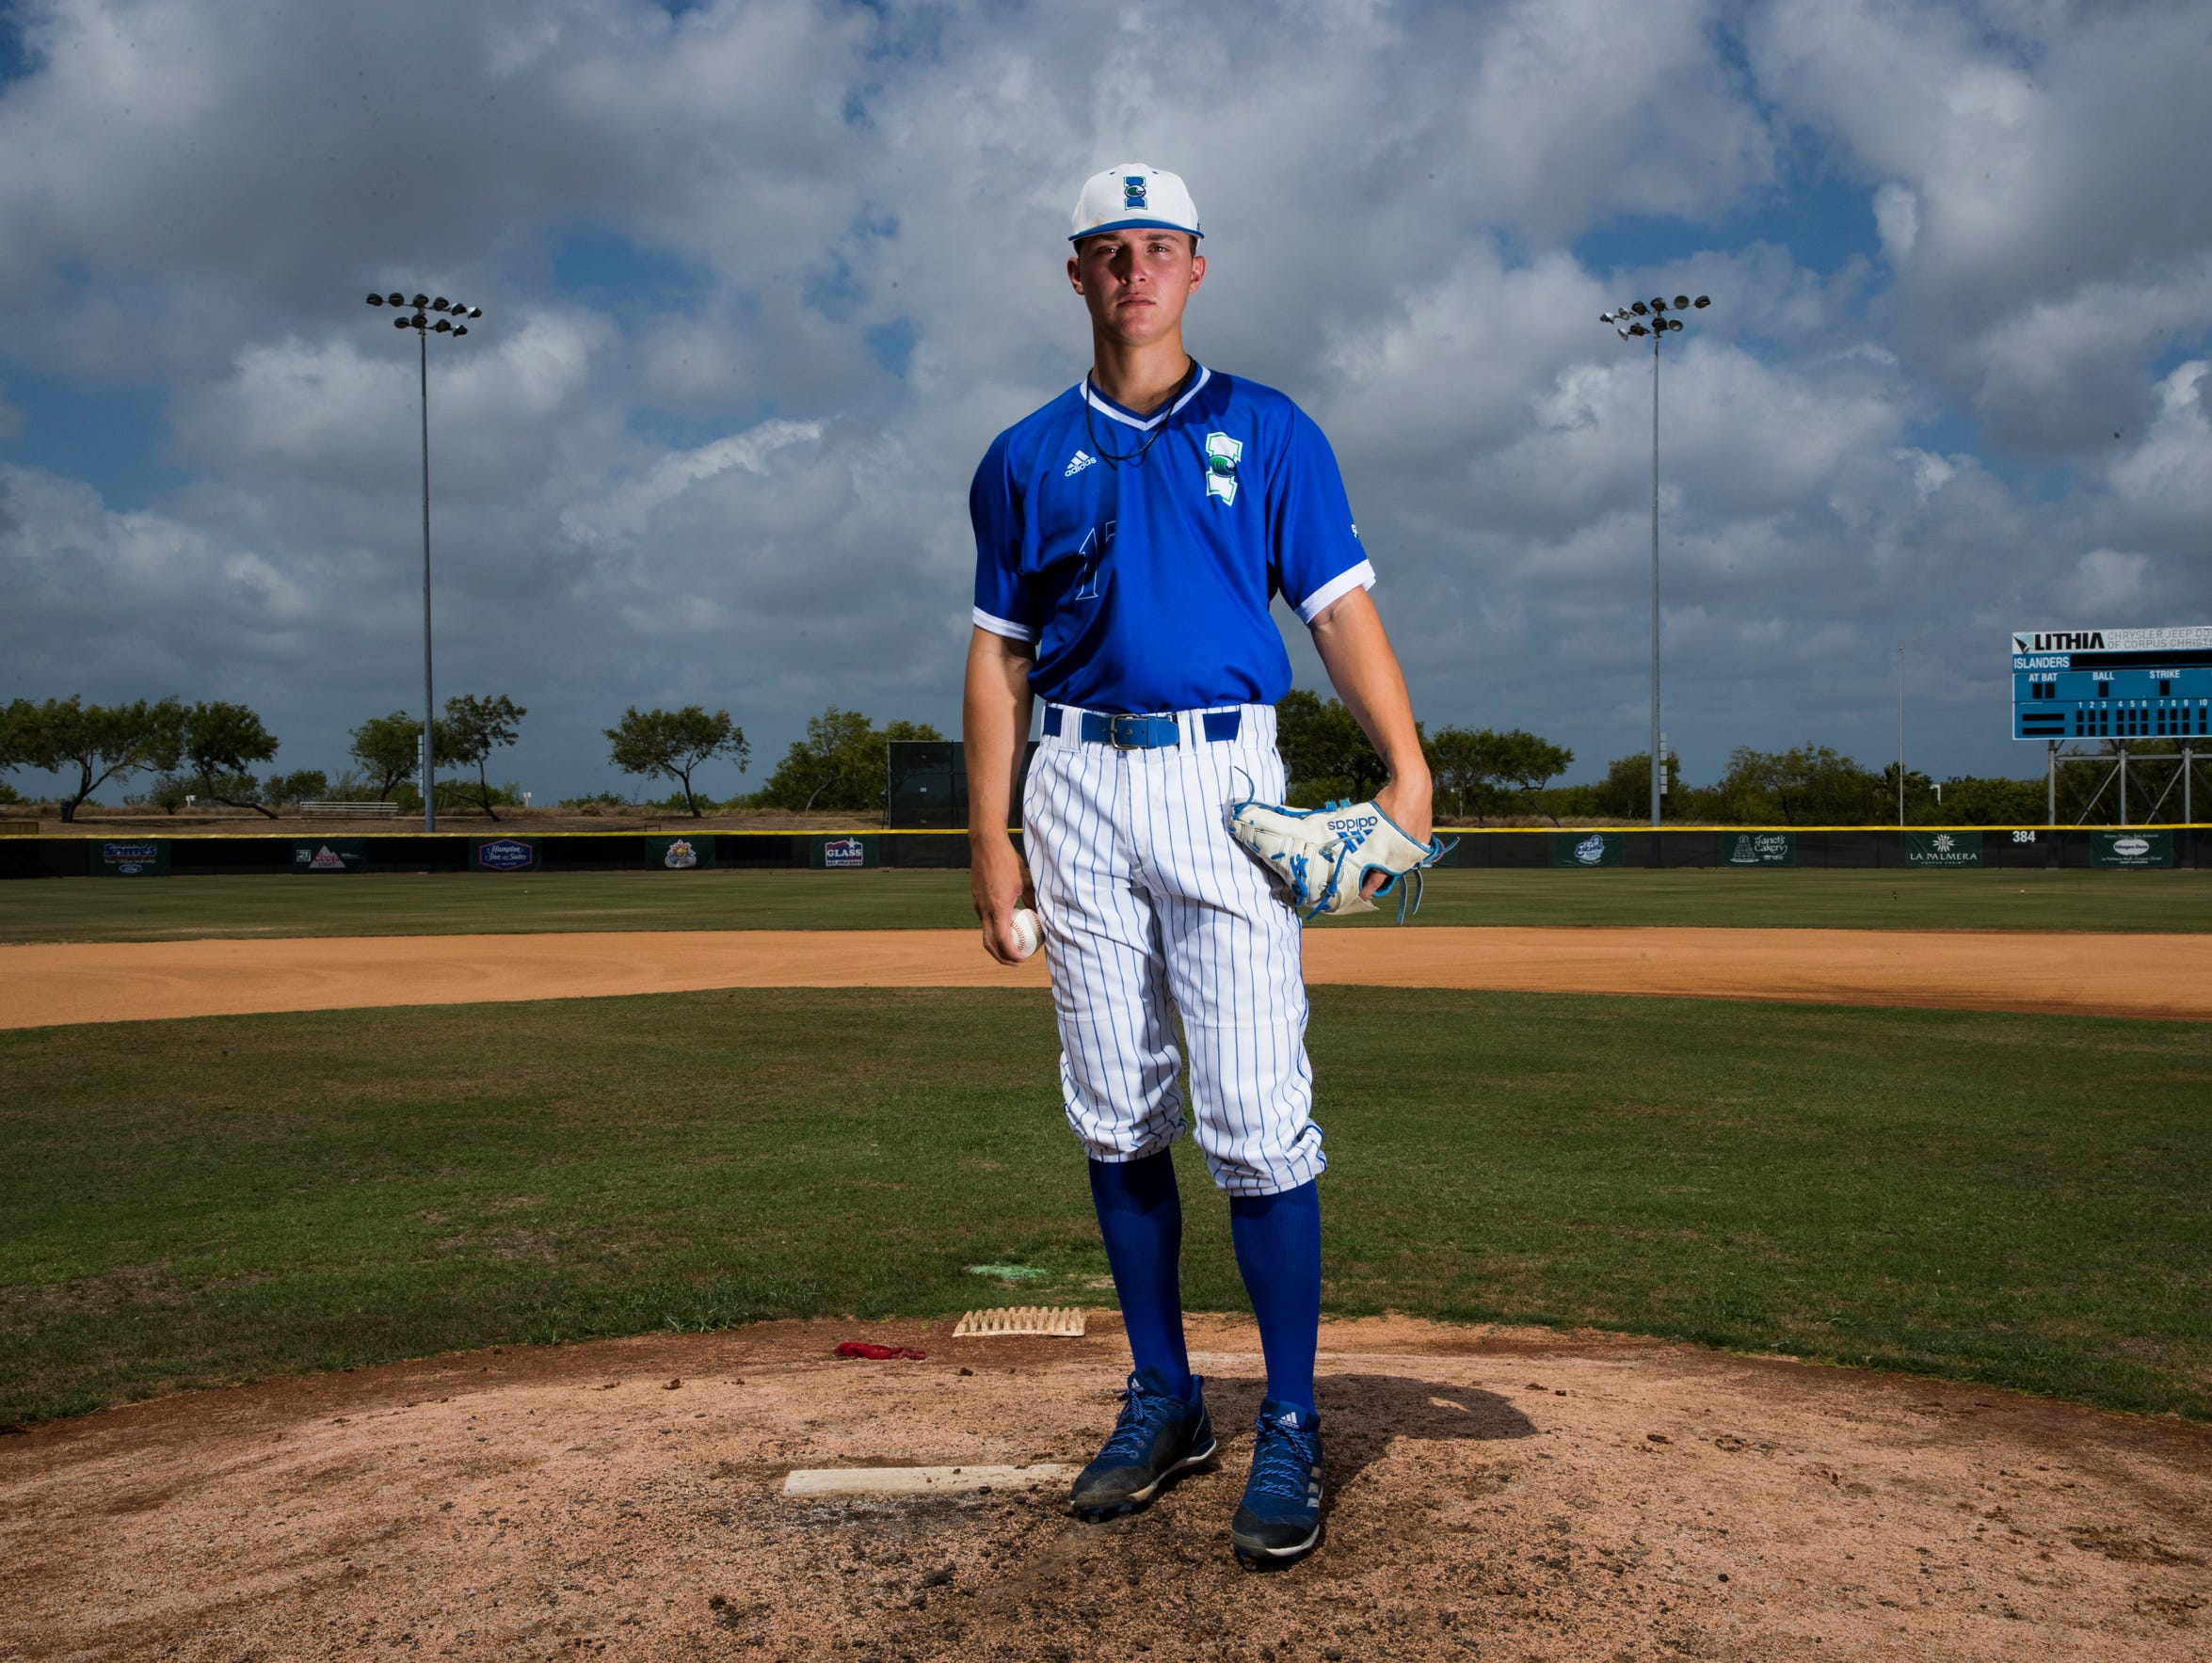 Texas A&M-Corpus Christi pitcher Aaron Hernandez poses